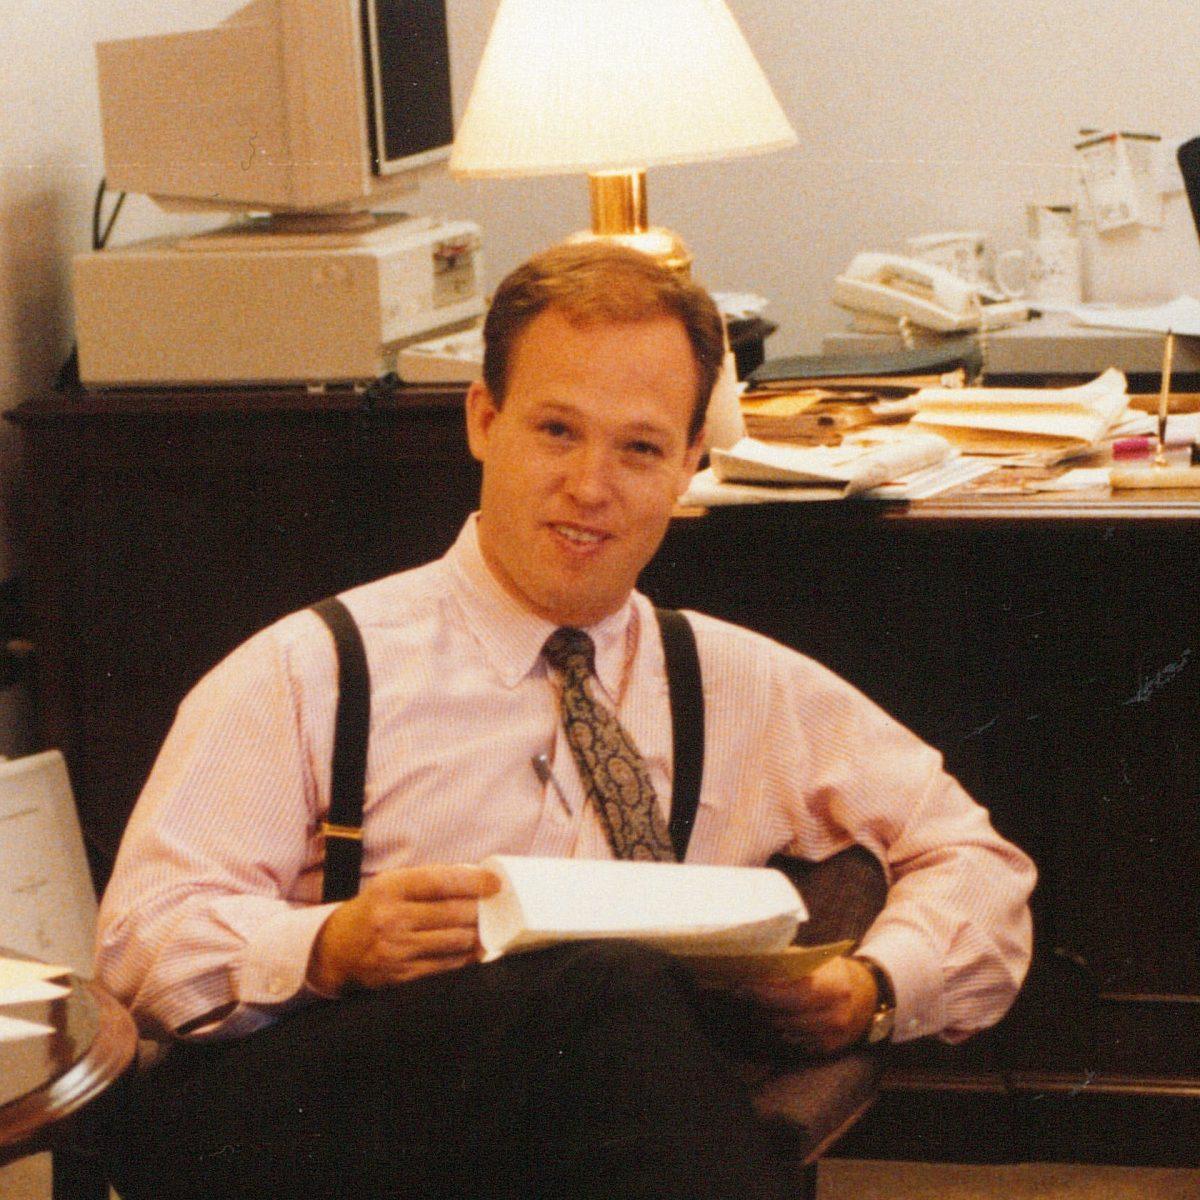 Mike Tucker c. 1991